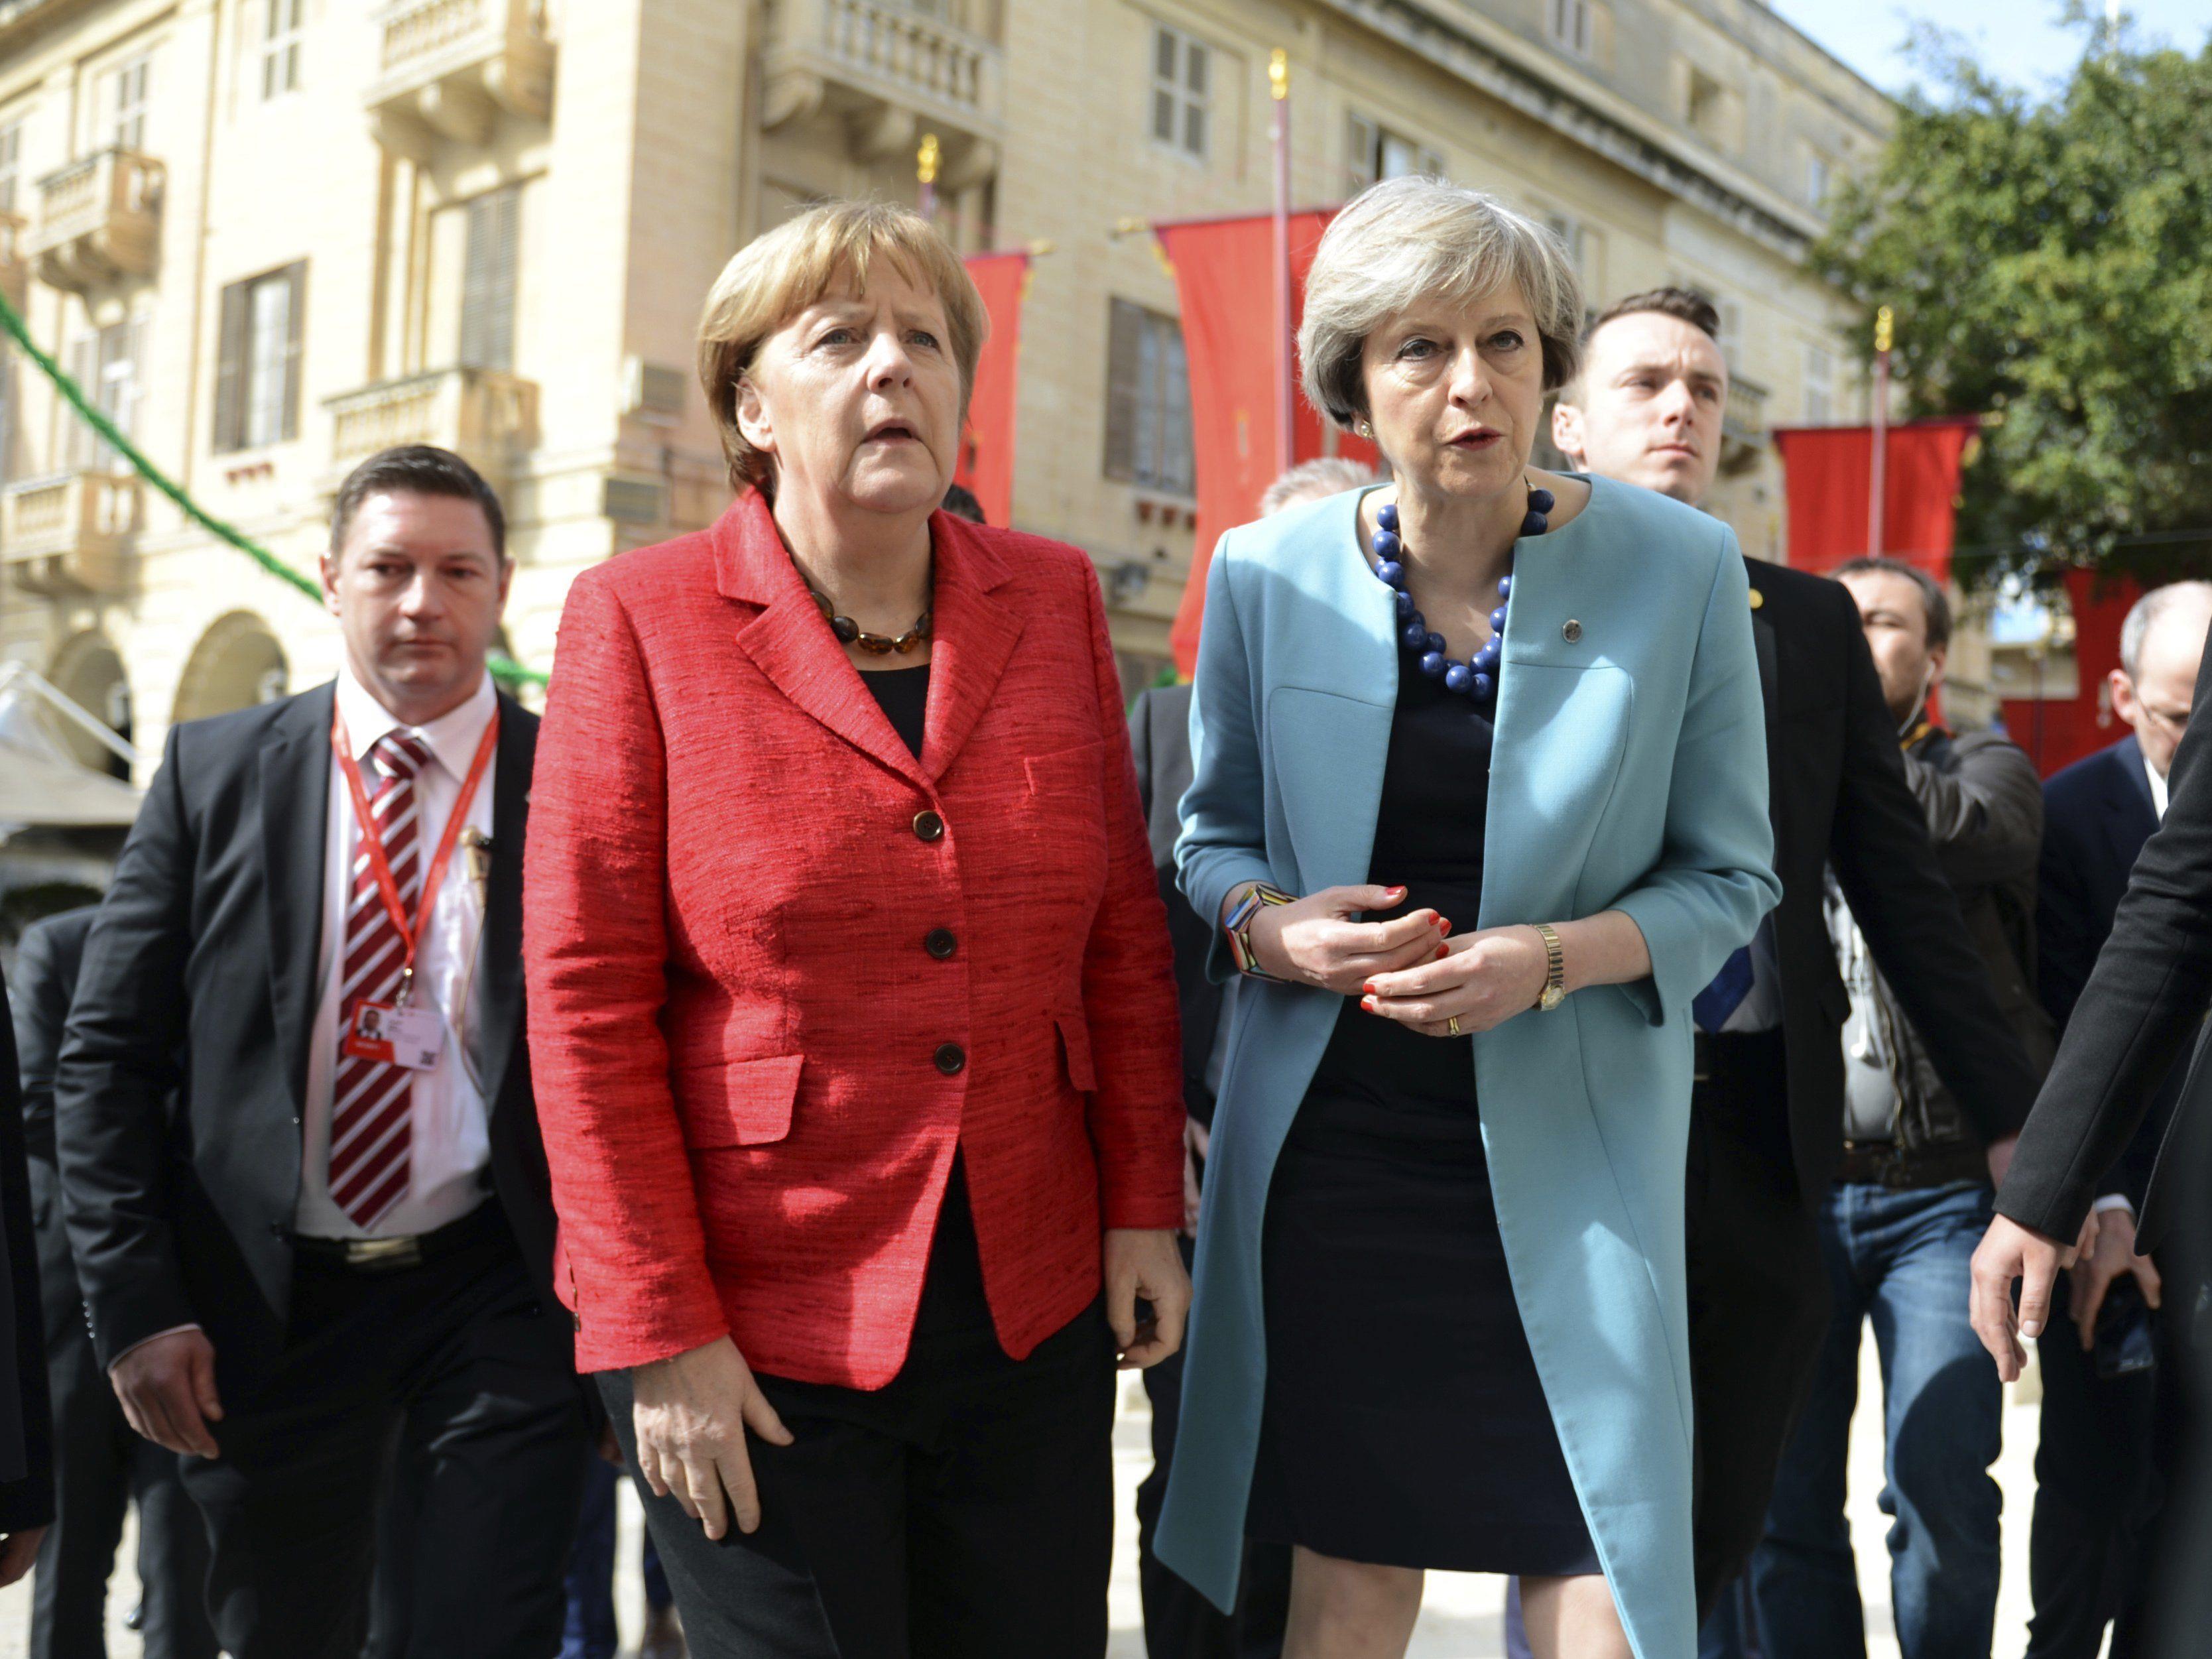 Angela Merkel und Theresa May beim EU-Gipfel am Freitag in Malta.